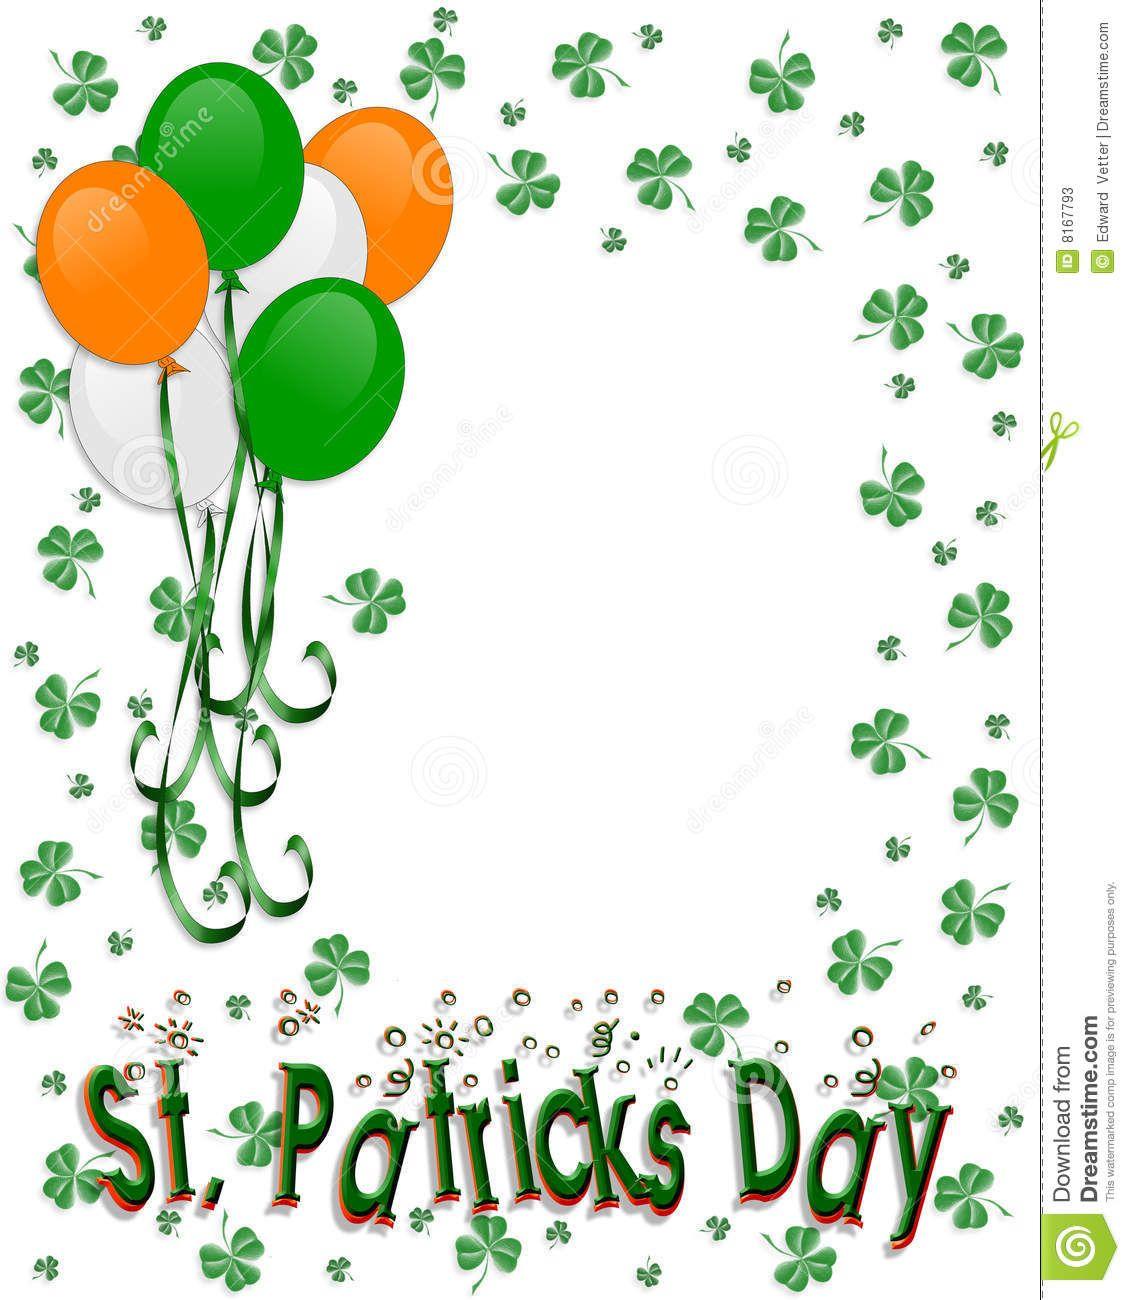 St Patrick\'s Day Border Balloons Stock Photos - Image: 8167793 ...